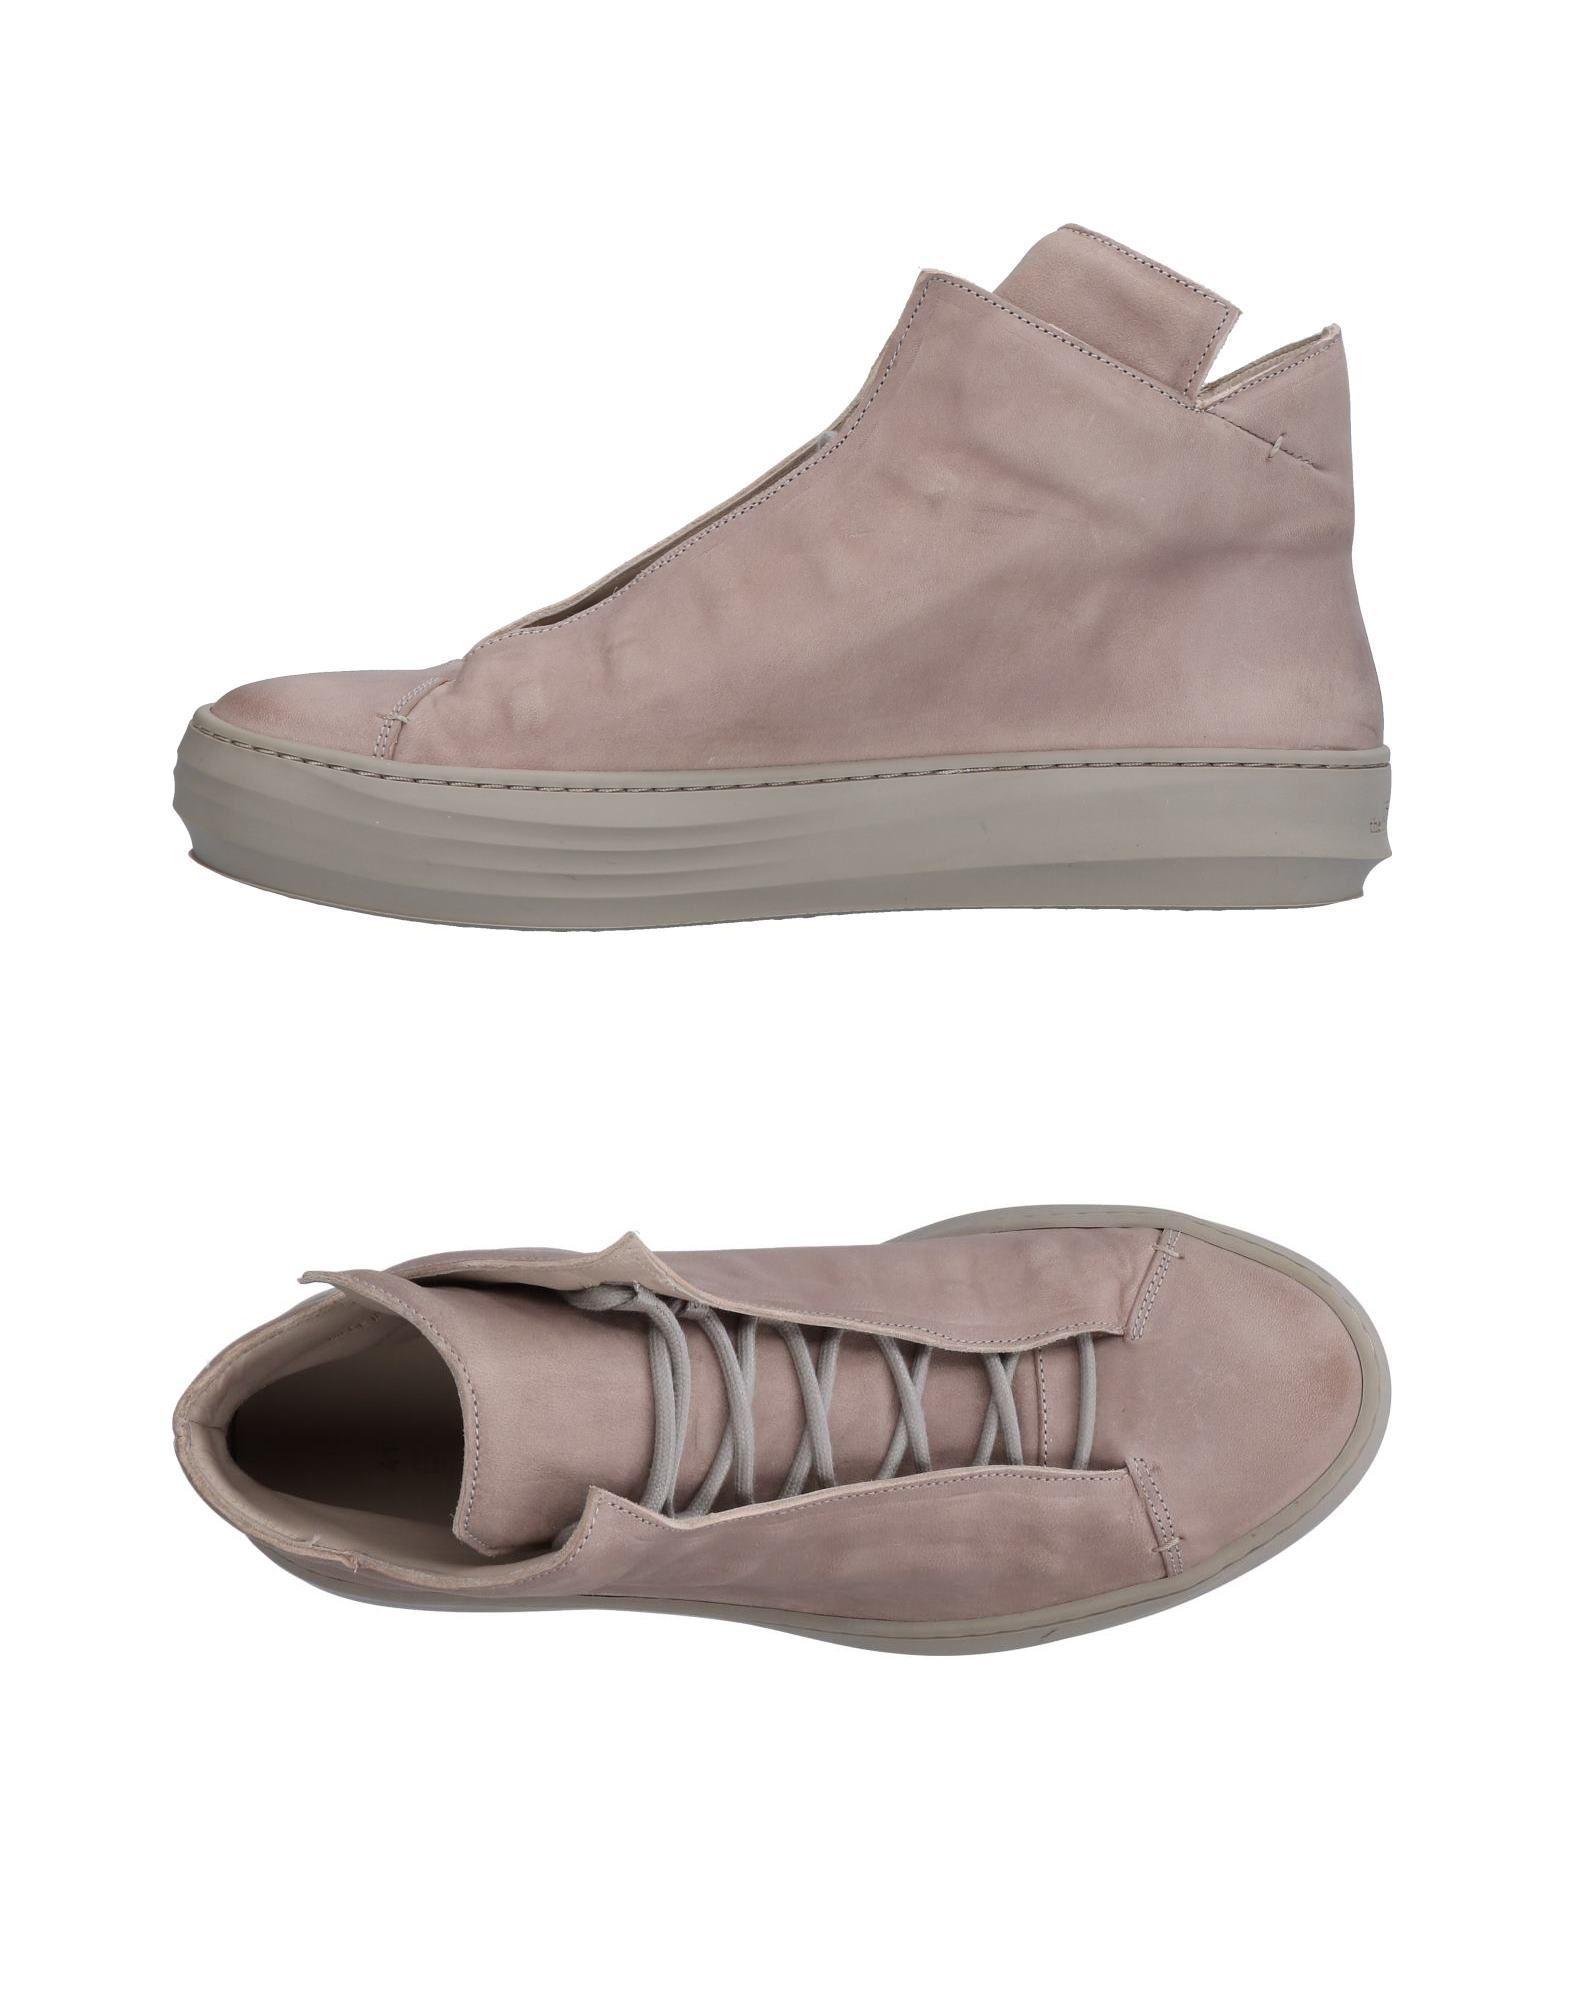 Sneakers The Last Conspiracy Uomo - 11517142WJ